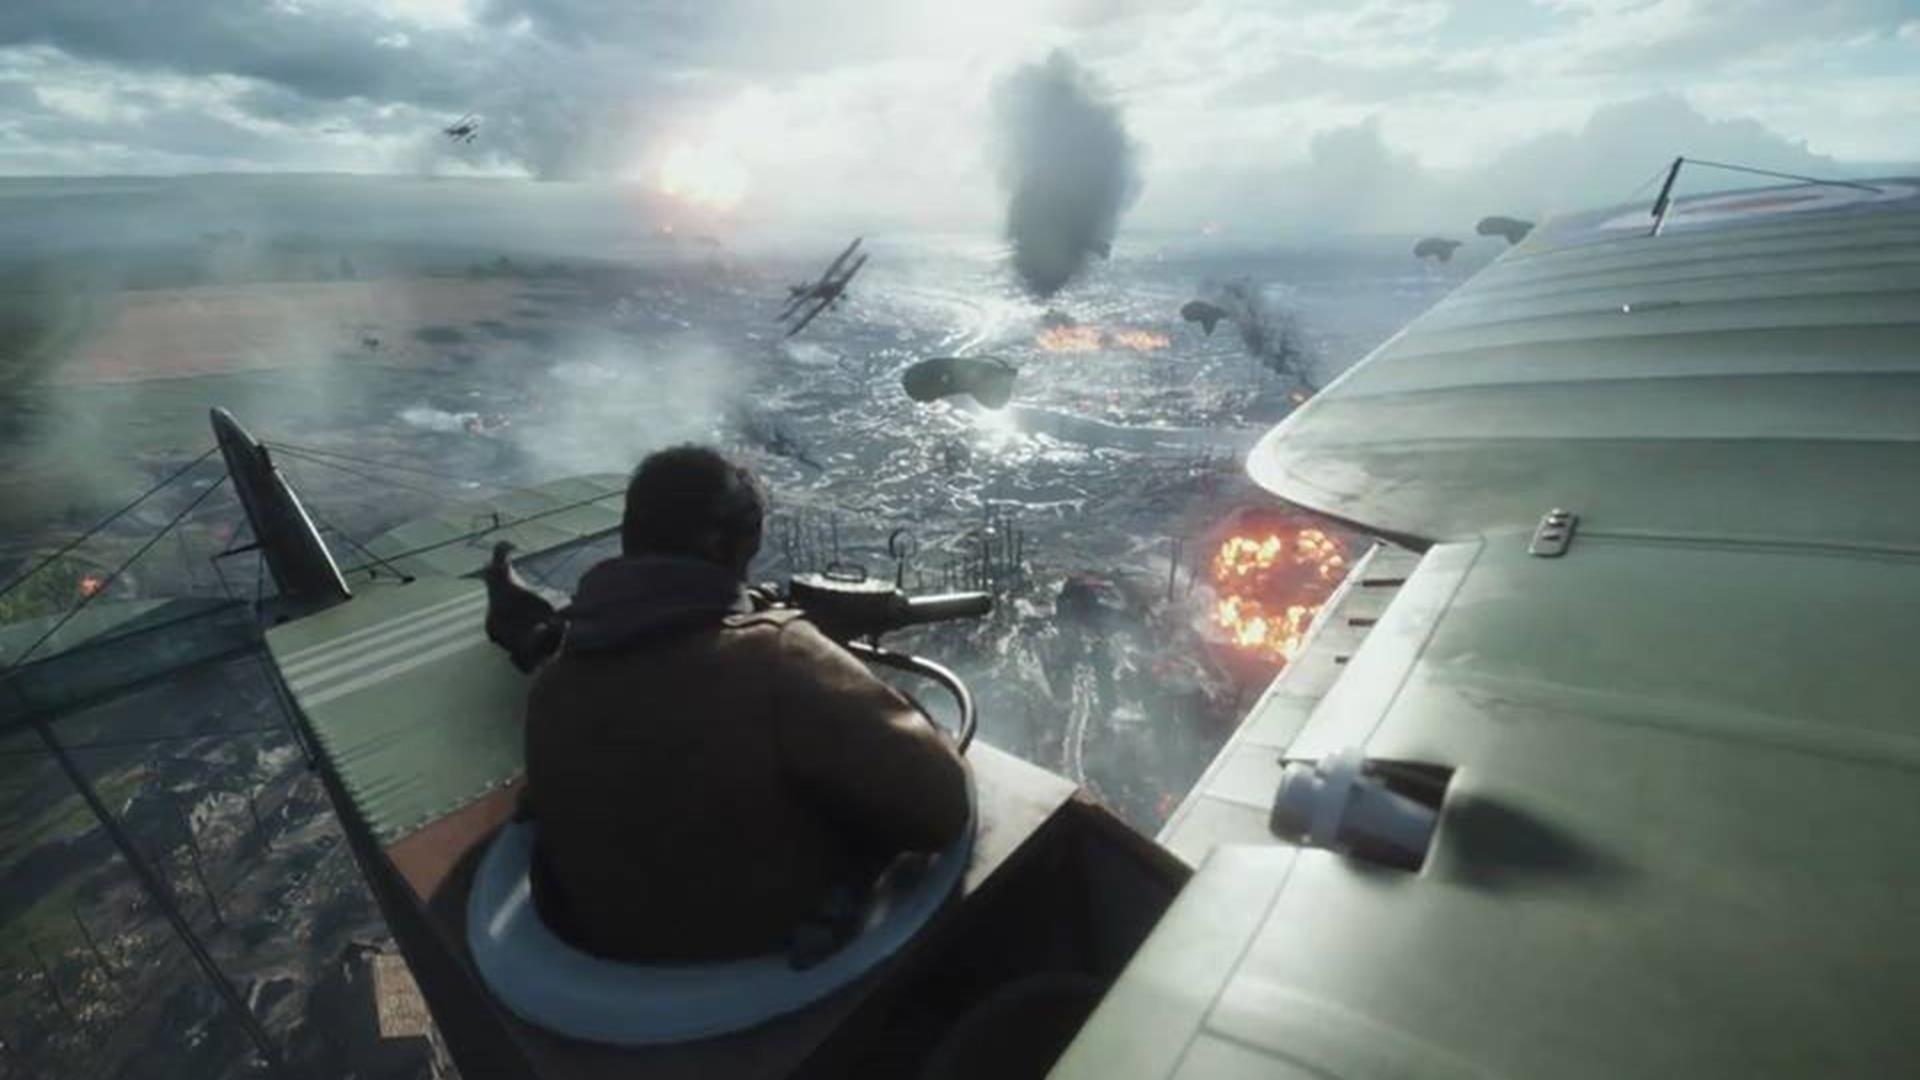 Fantastic Battlefield 1 Wallpaper 1080p ~ Sdeerwallpaper | Game | Pinterest HU46